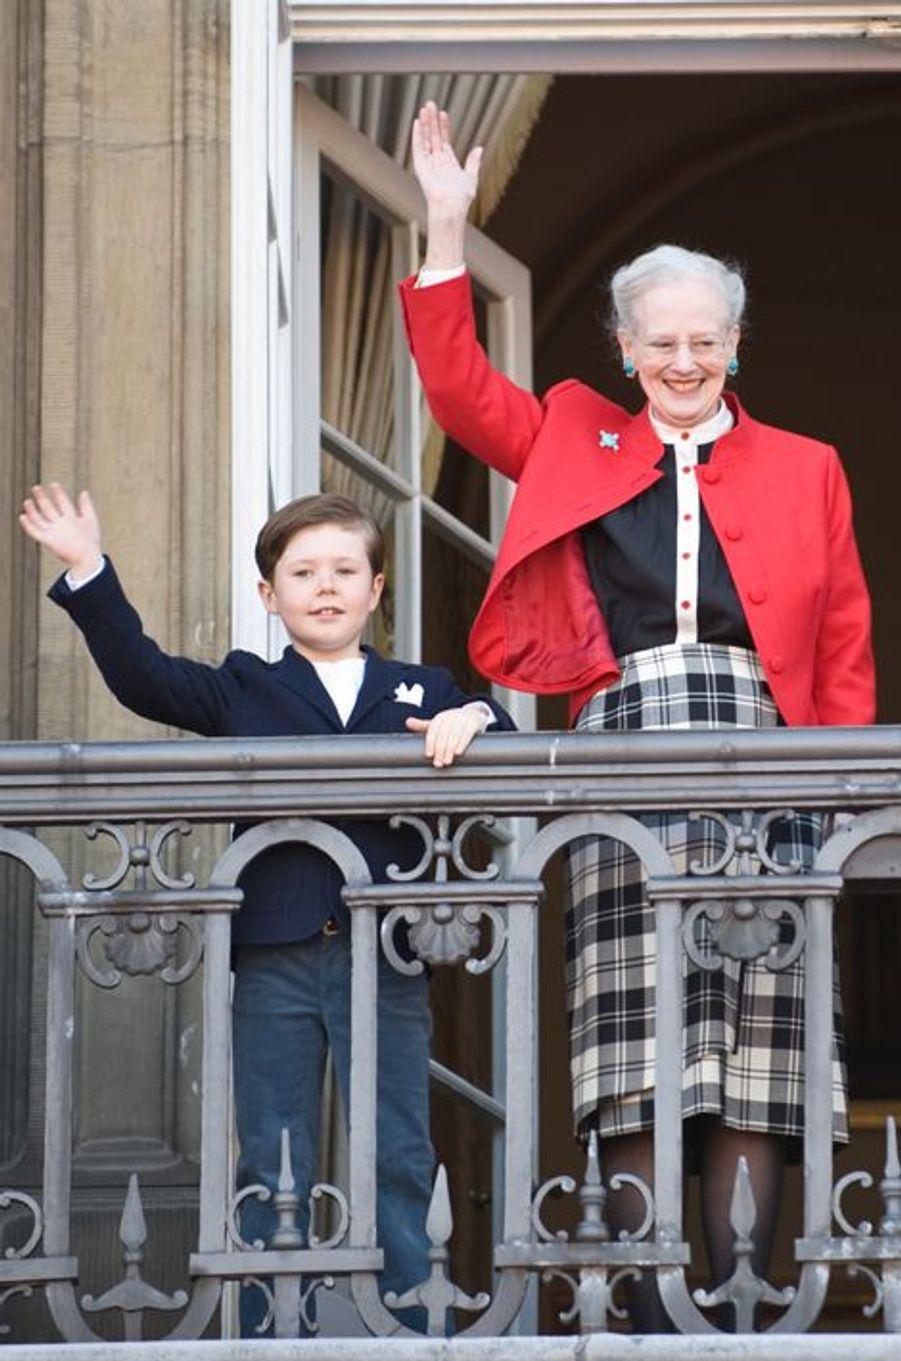 Le prince Christian de Danemark avec la reine Margrethe II le 16 avril 2013